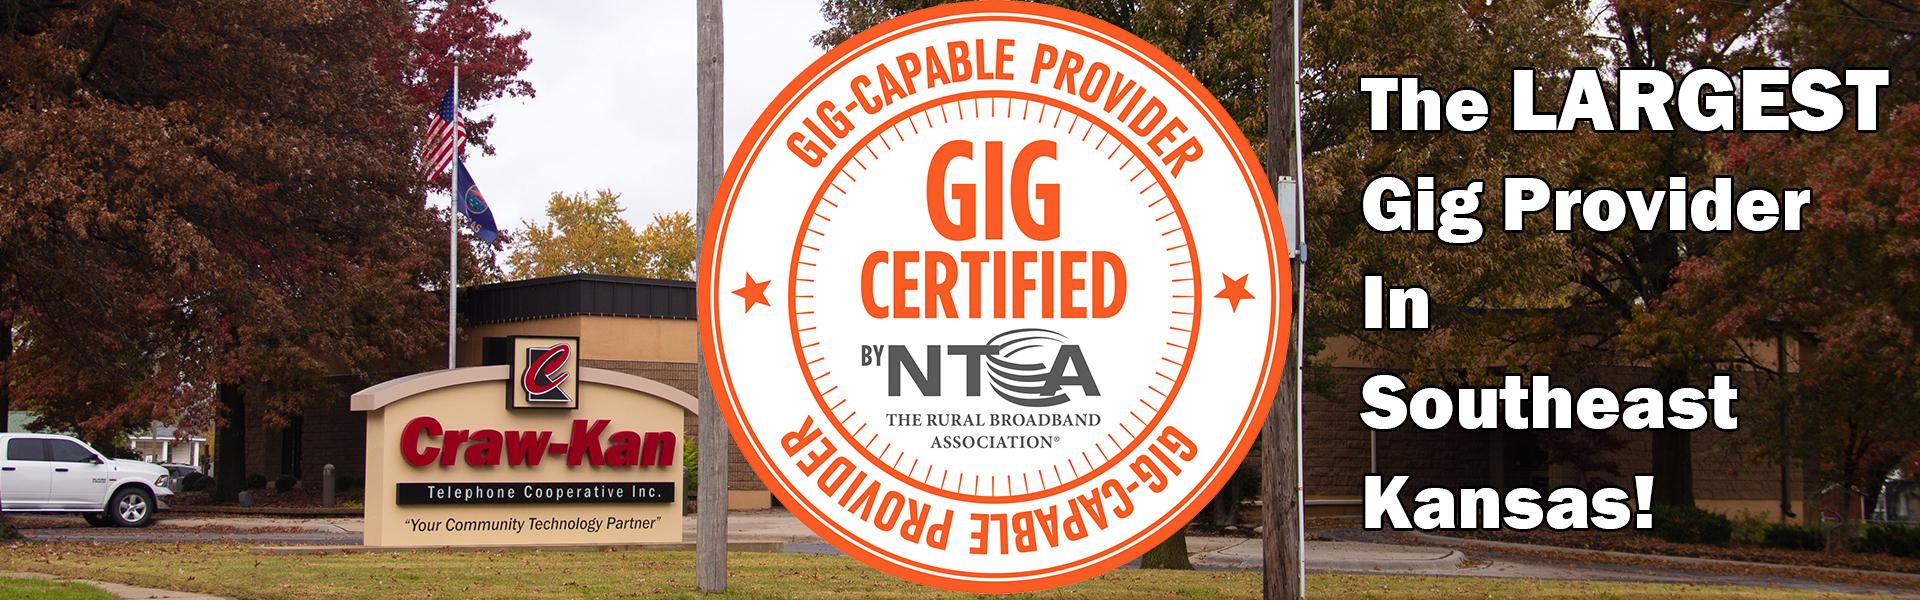 Gig Certified